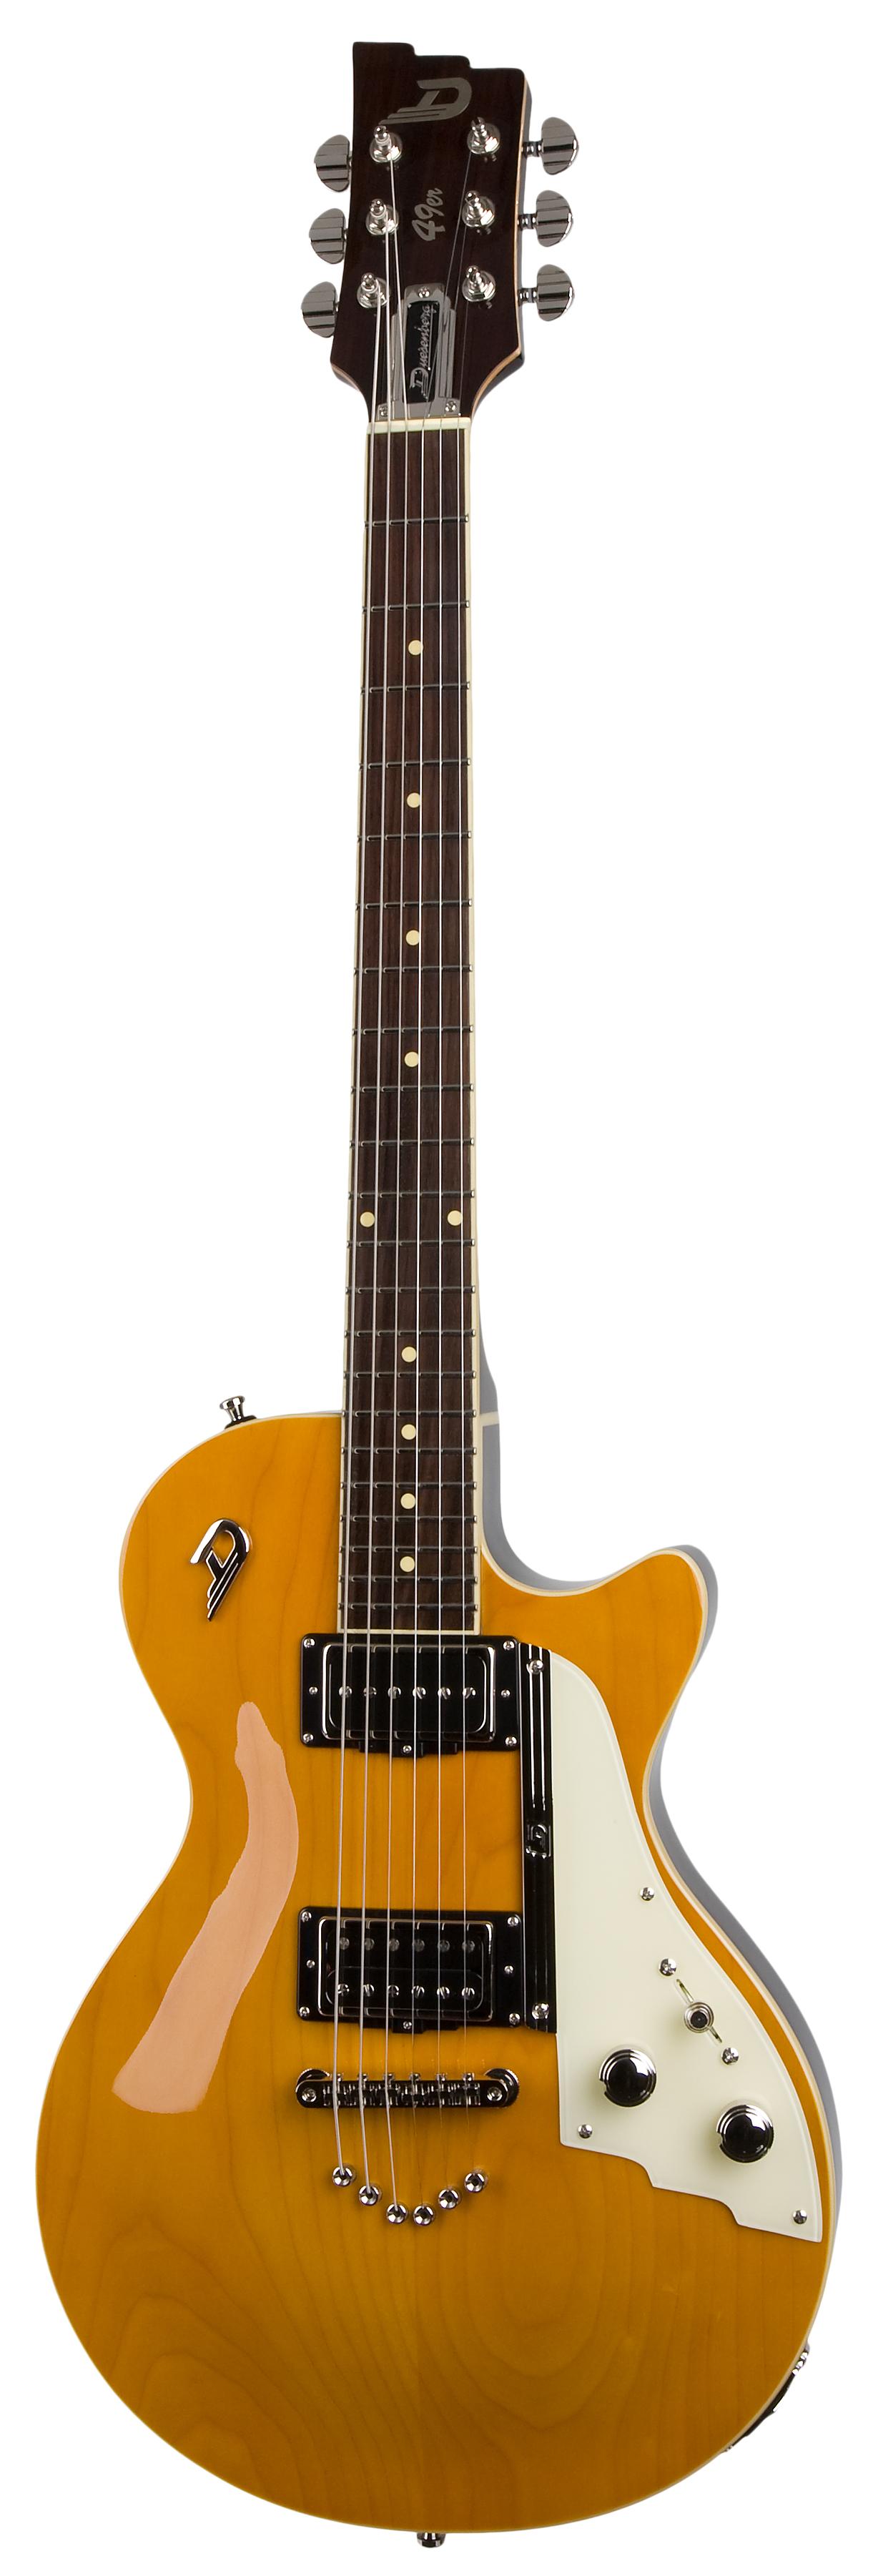 duesenberg 49er 2016 honey guitar for sale headbanger rare guitar. Black Bedroom Furniture Sets. Home Design Ideas